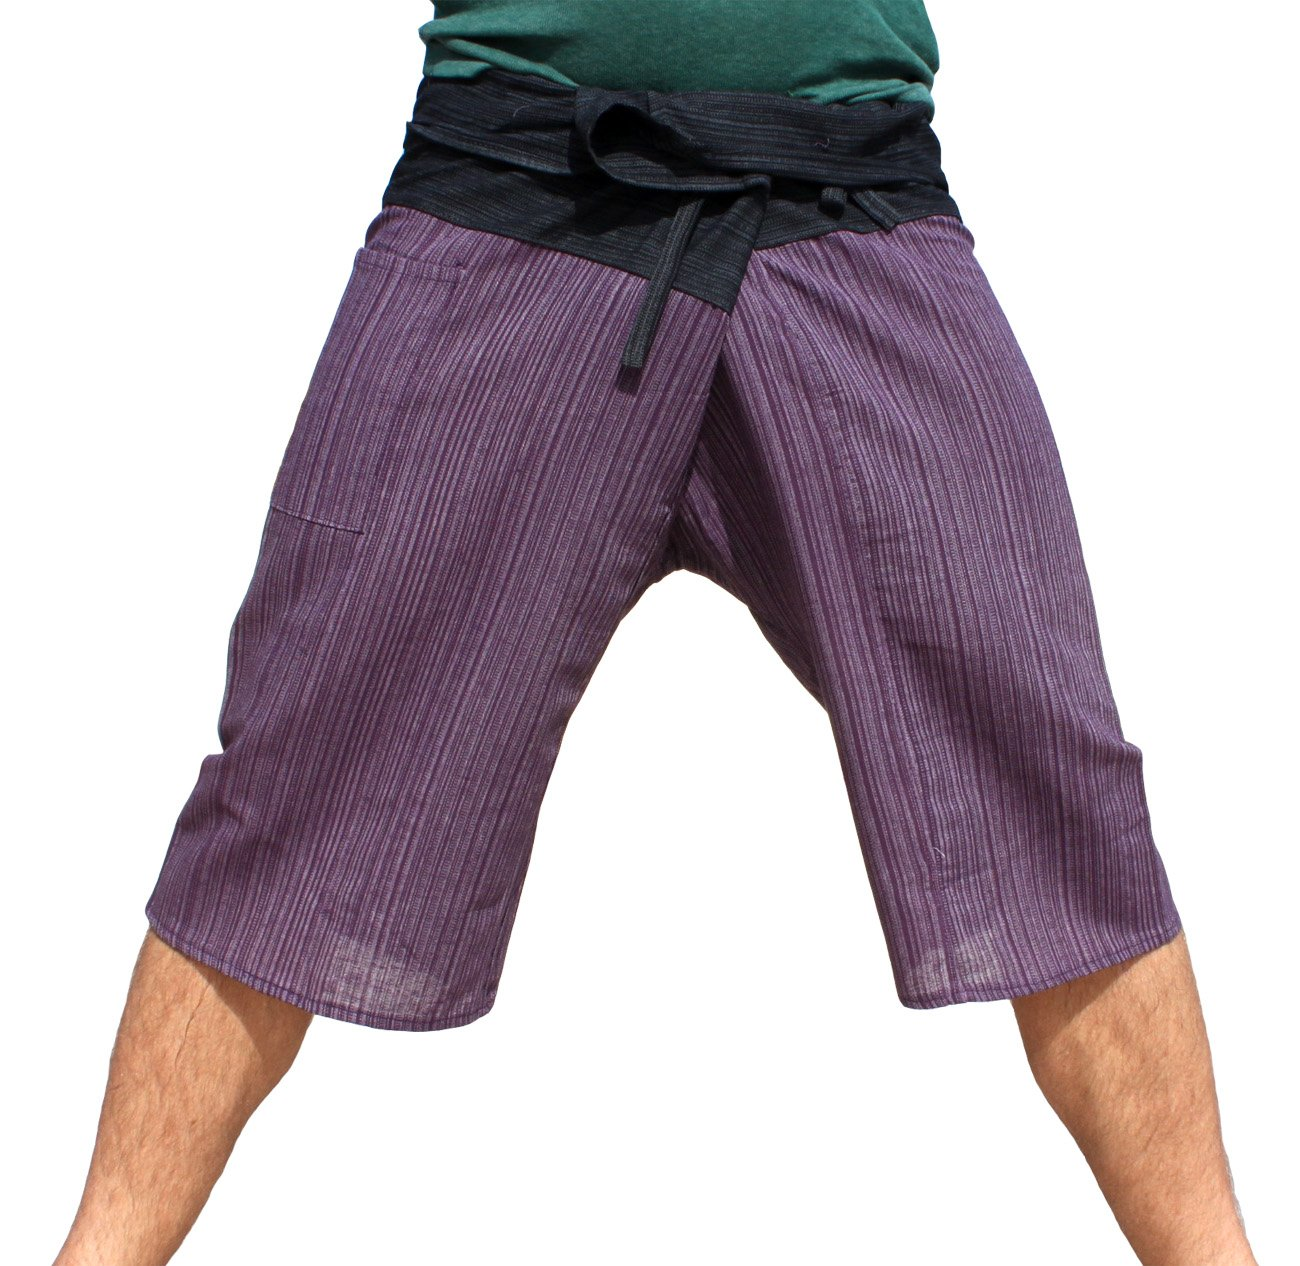 Raan Pah Muang Thin Striped Cotton Two Tone Fisherman Capri Wrap Plus Sized Pants, XX-Large, Black and Dark Violet by Raan Pah Muang